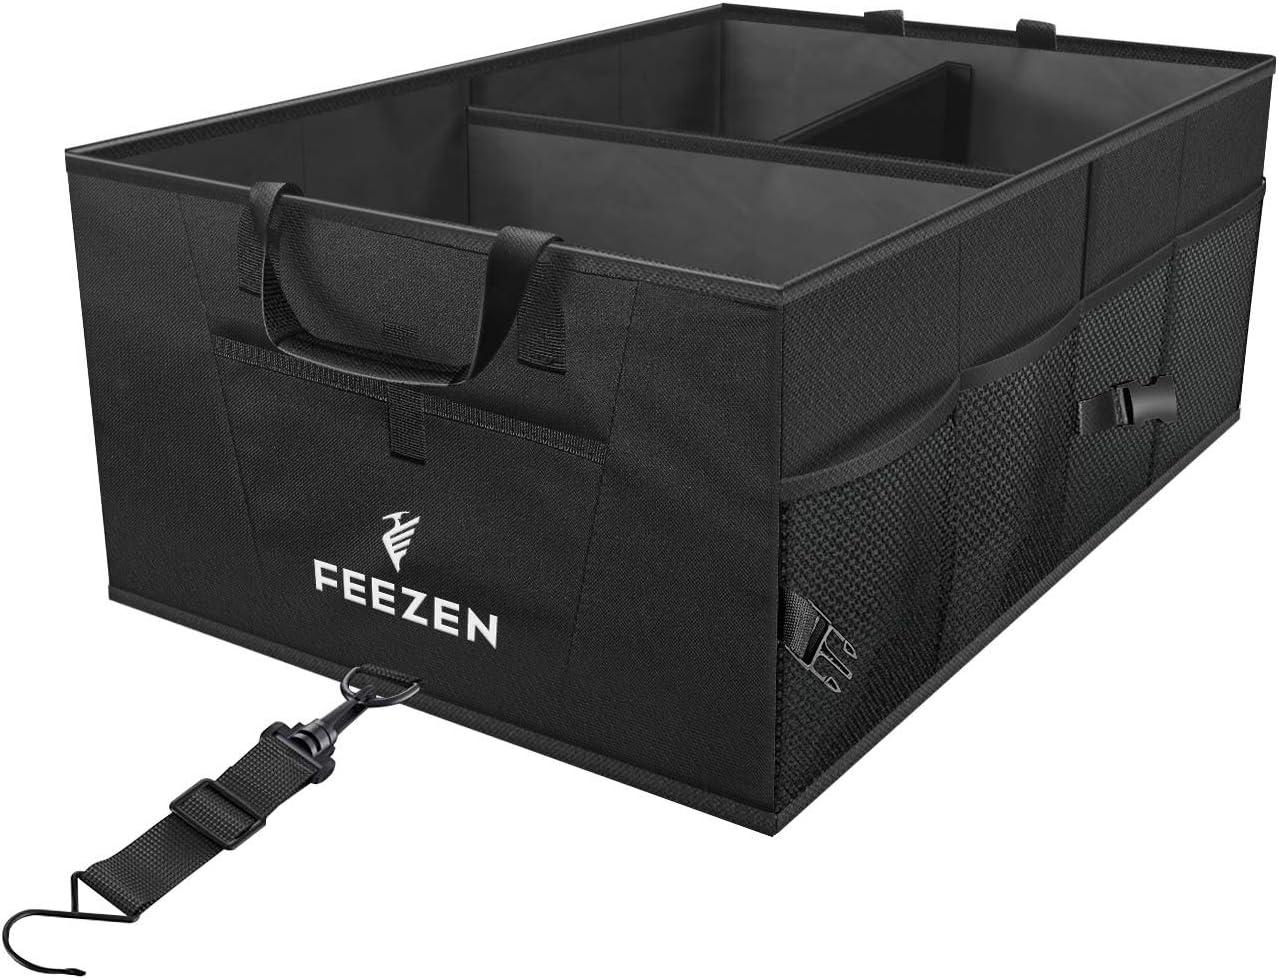 Feezen(フィーゼン) 車用トランクオーガナイザー SUV/車/トラック/乗用車/ミニバンに最適 ご家庭用 丈夫で耐久性に優れた構造 滑り止め付き 防水加工済み